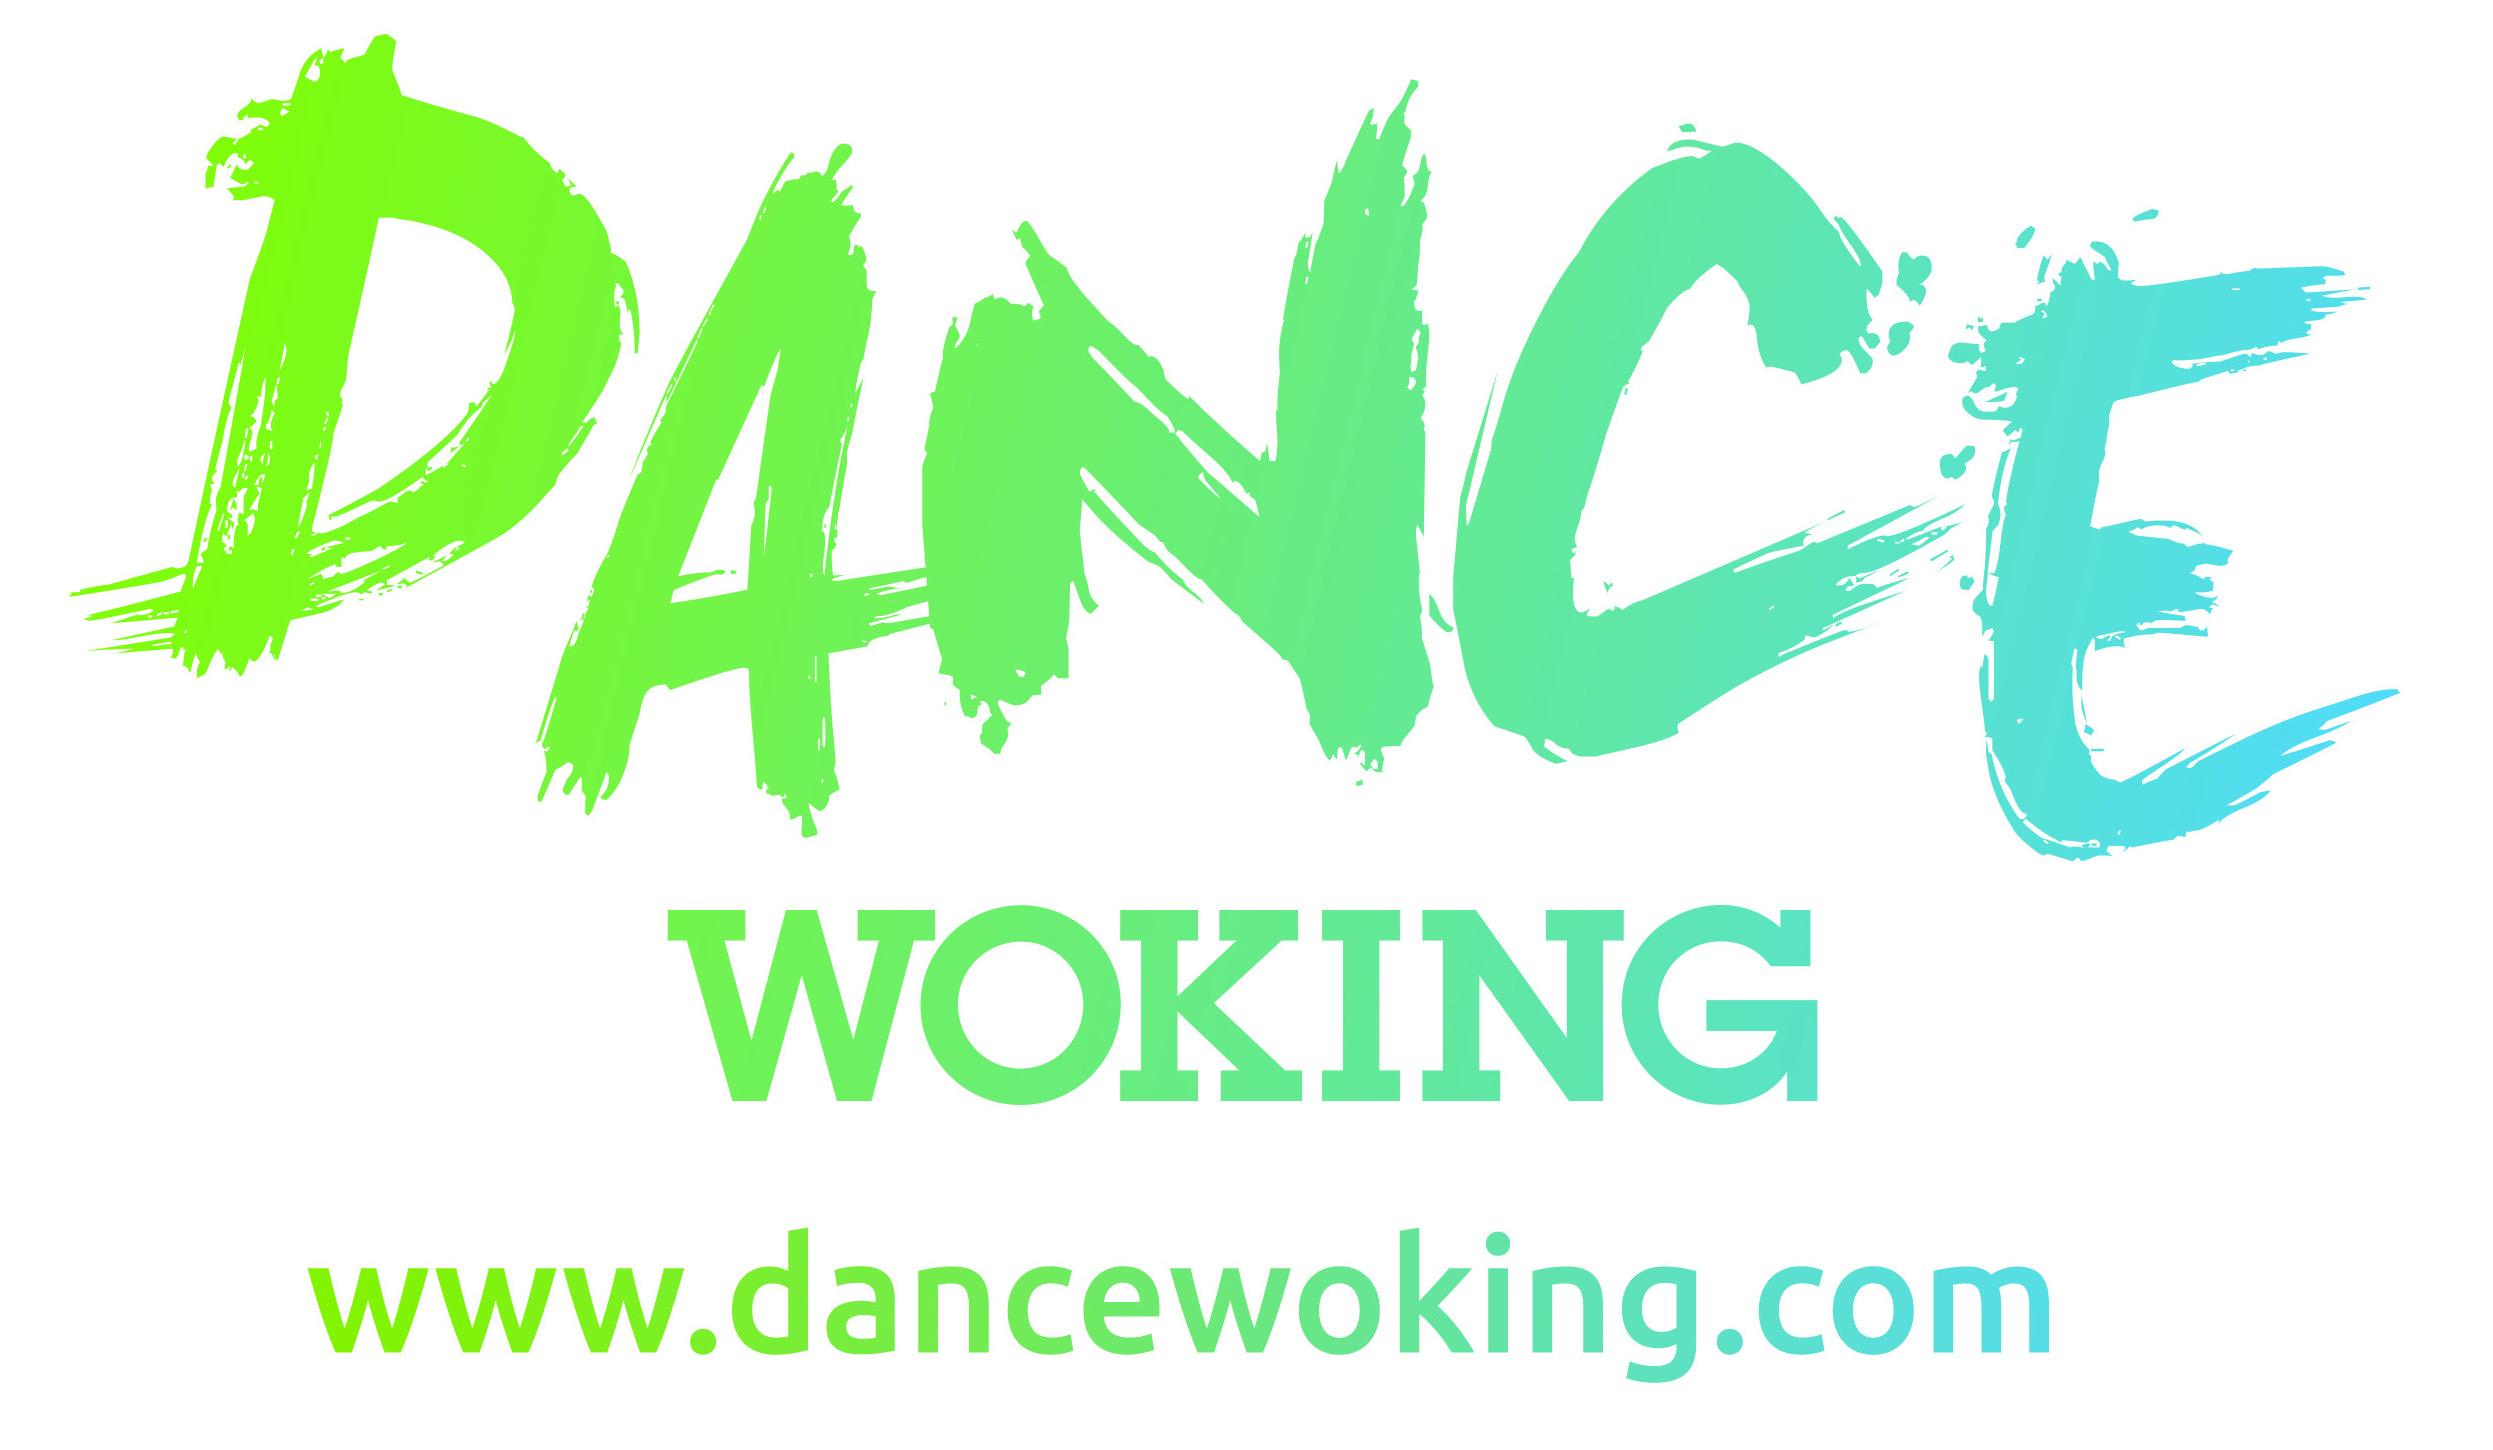 7. Dance Woking